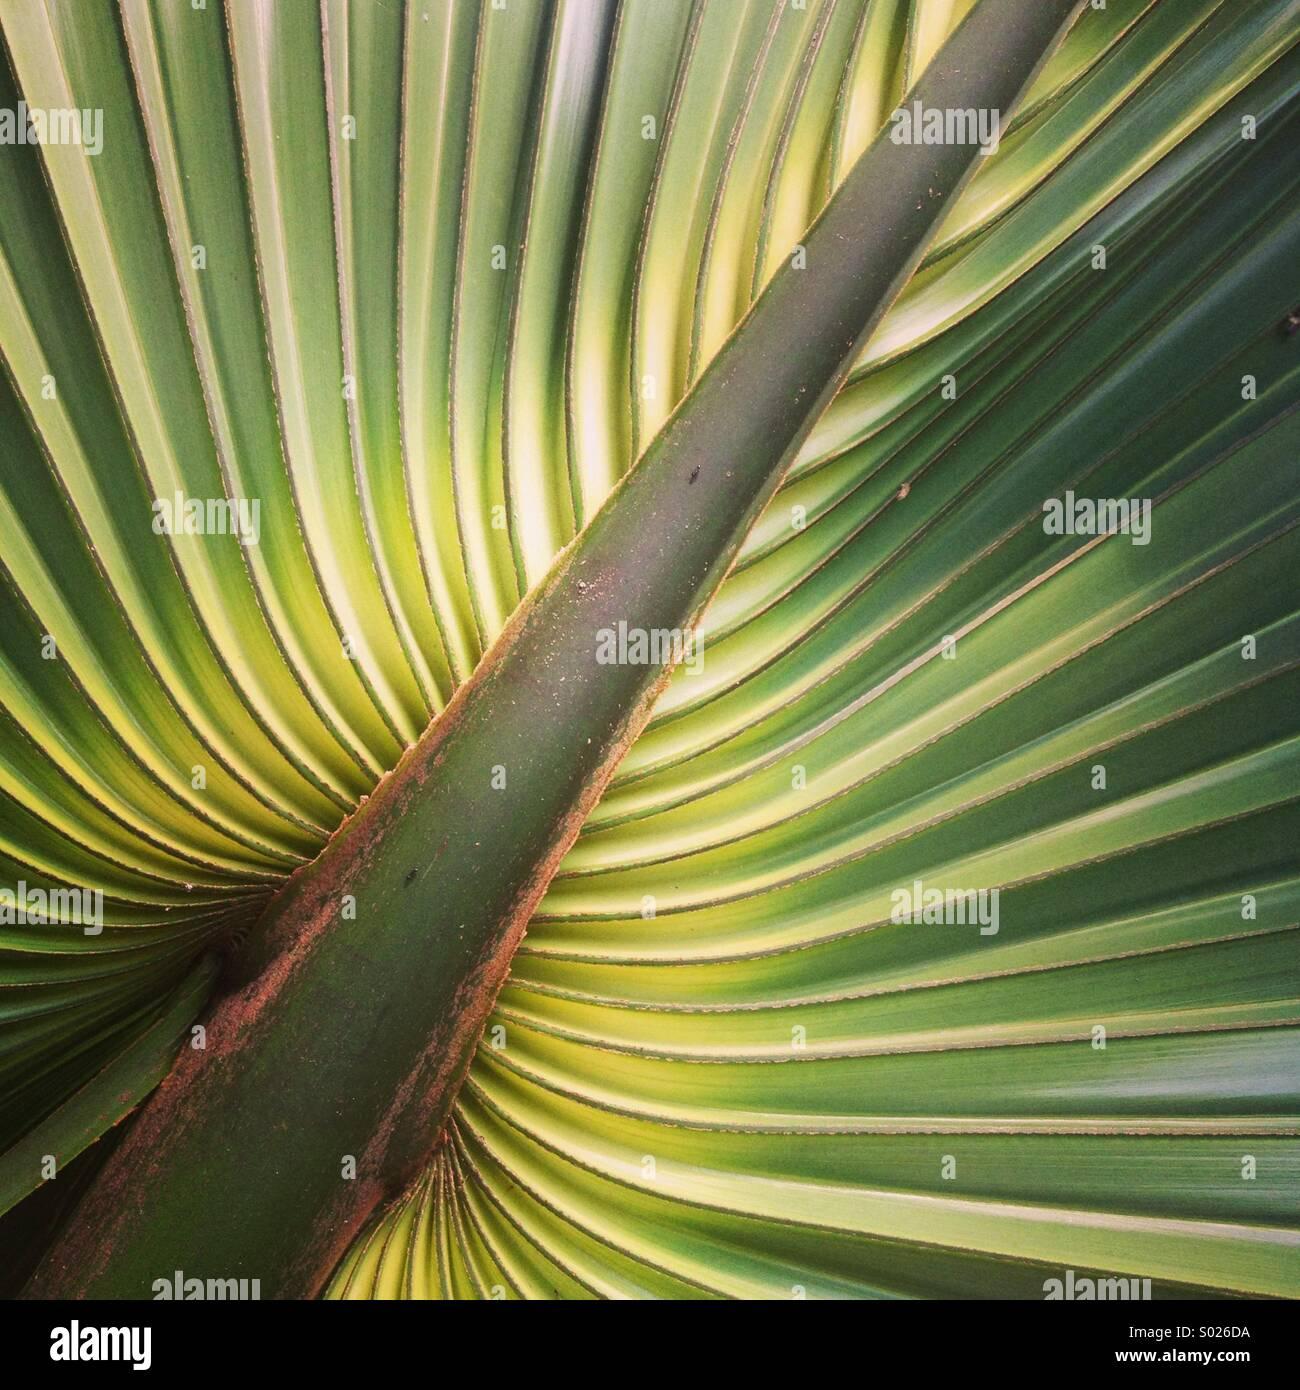 Palm leaf detail, Yucatan Peninsula, Mexico - Stock Image